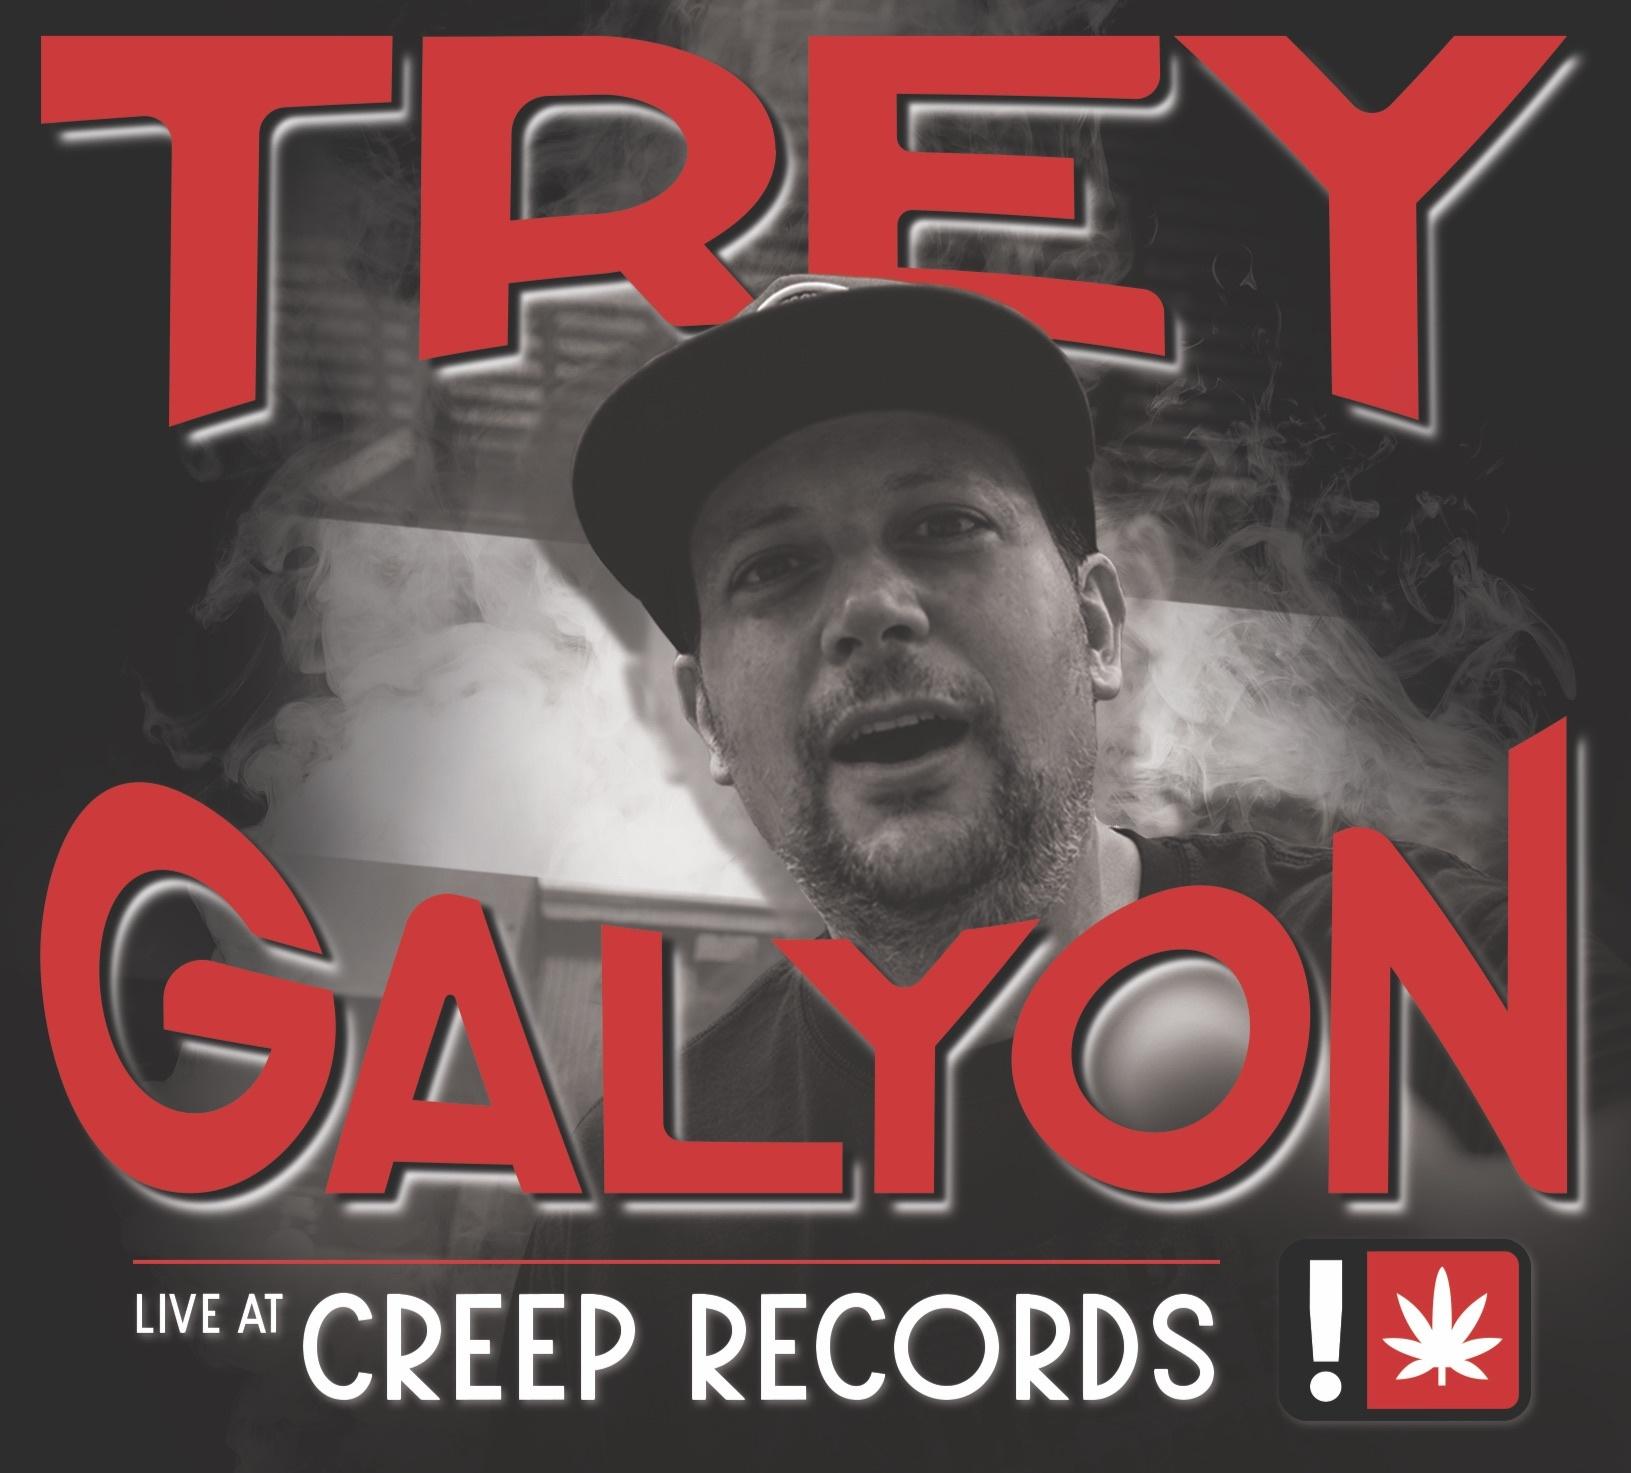 Trey Galyon Live Comedy Album